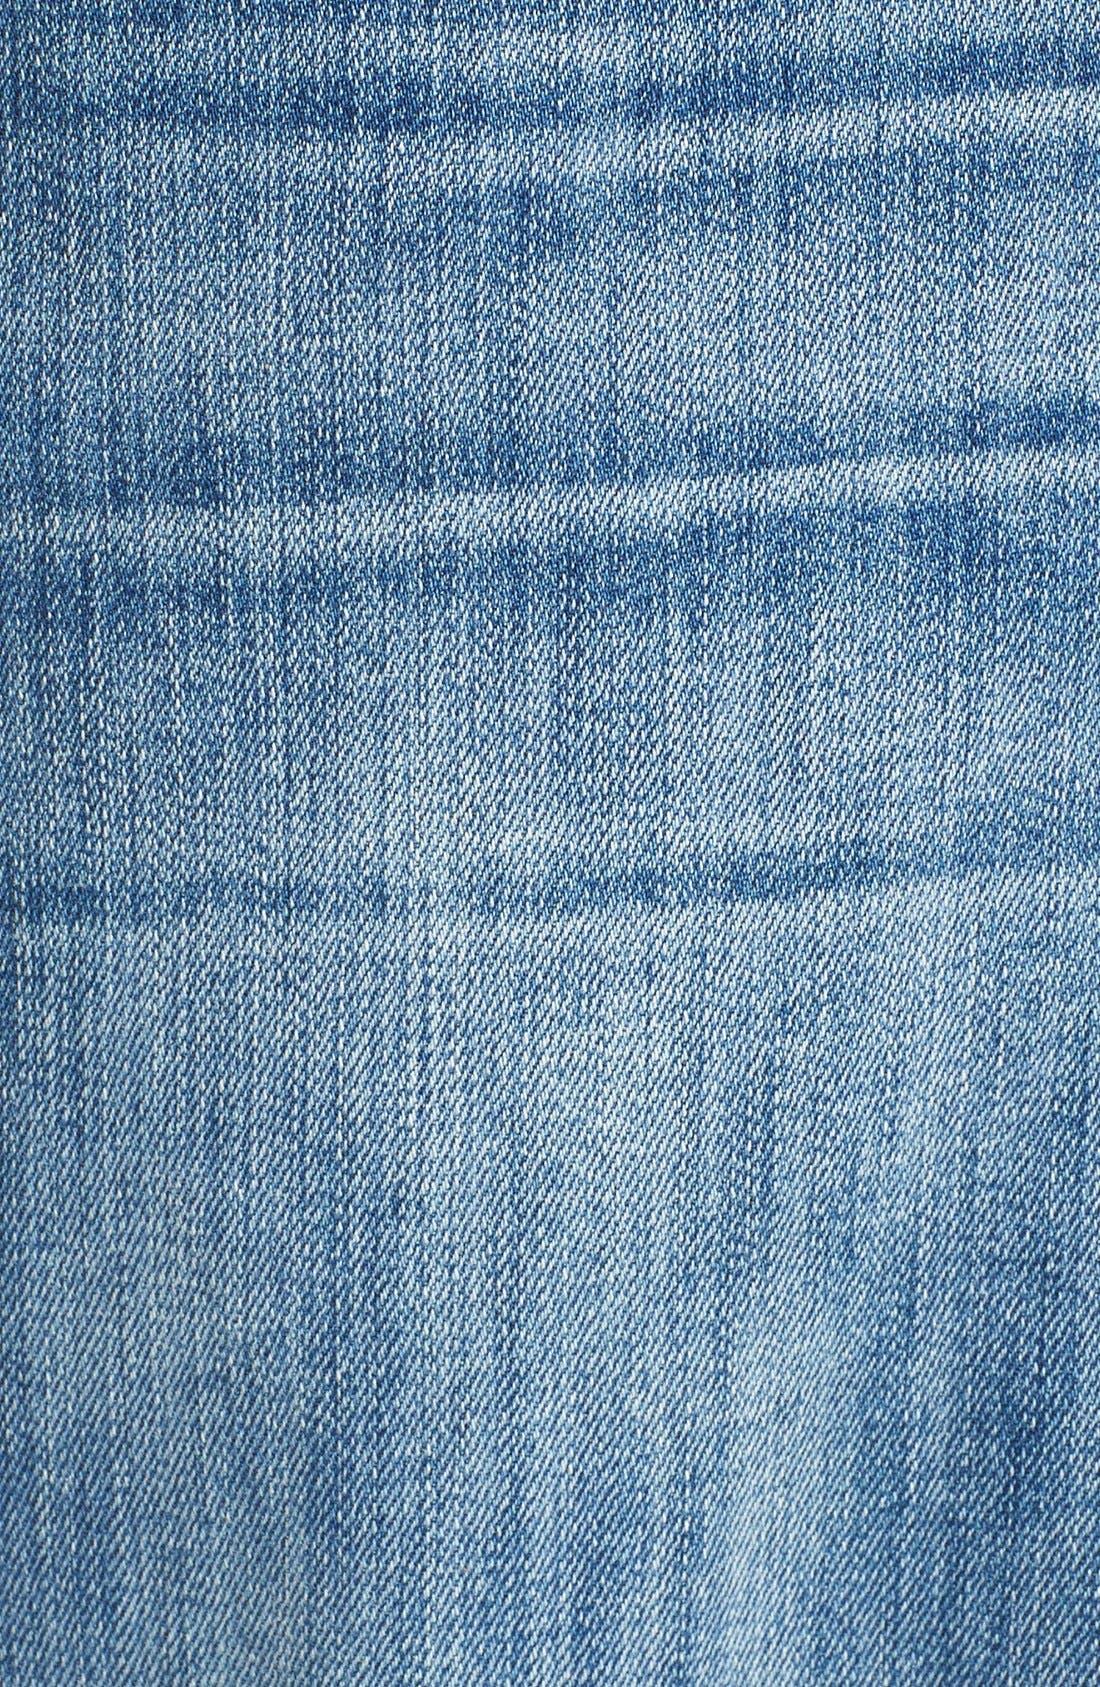 Luxe Performance - Austyn Relaxed Straight Leg Jeans,                             Alternate thumbnail 5, color,                             NAKKITTA BLUE